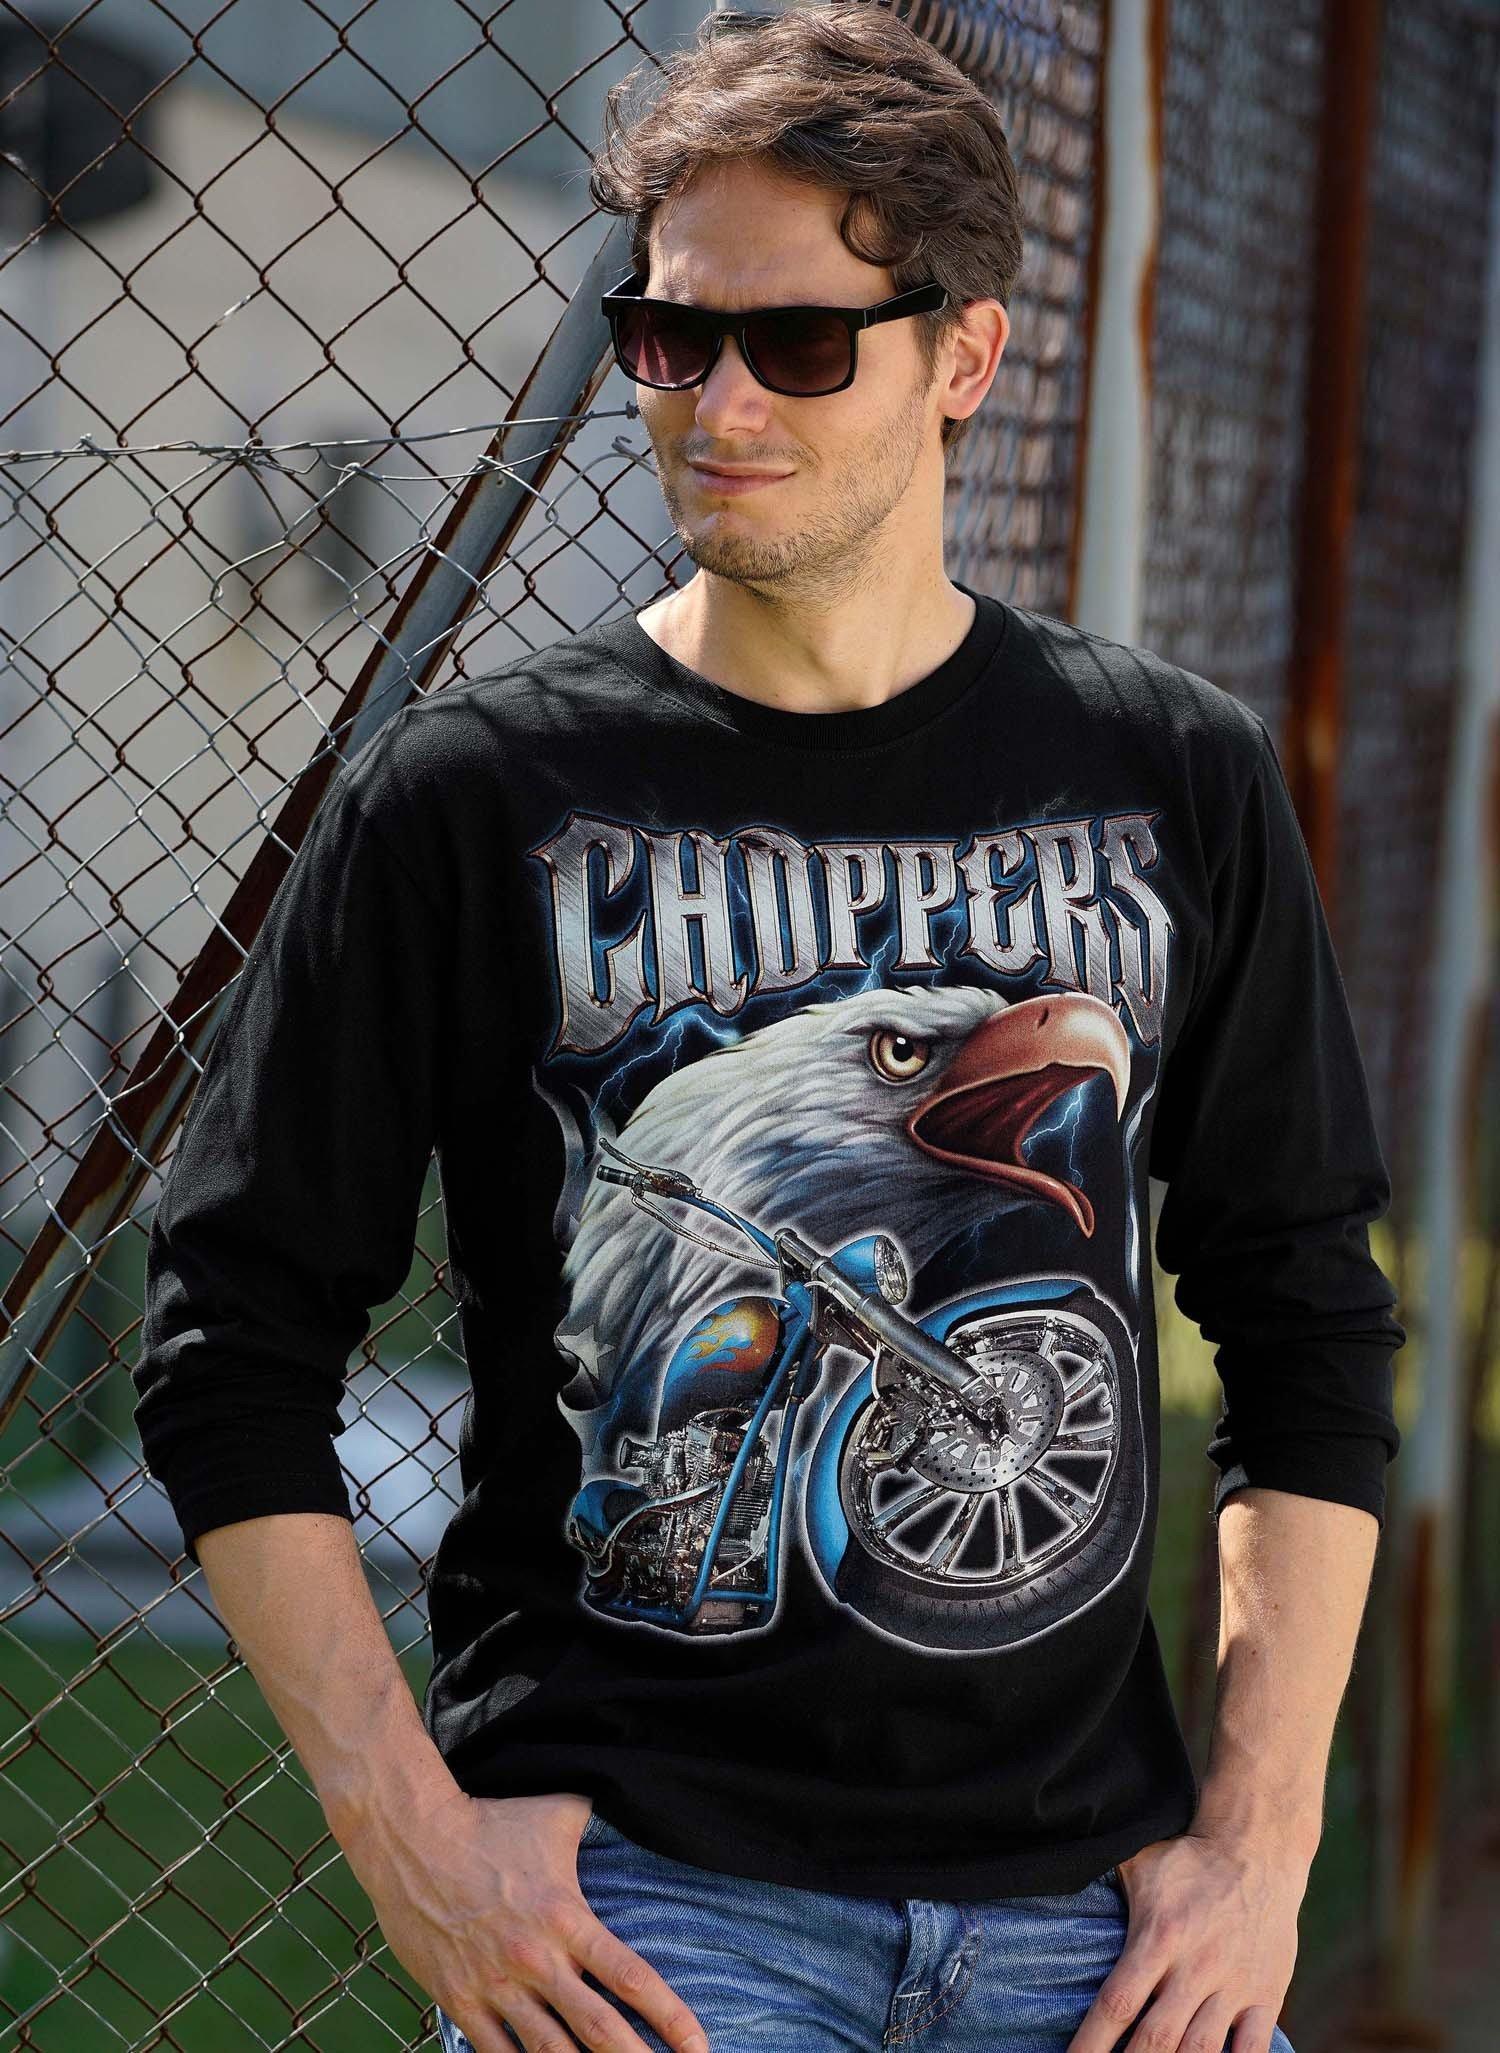 H-Shirt Ml, Aigle/Moto, noir